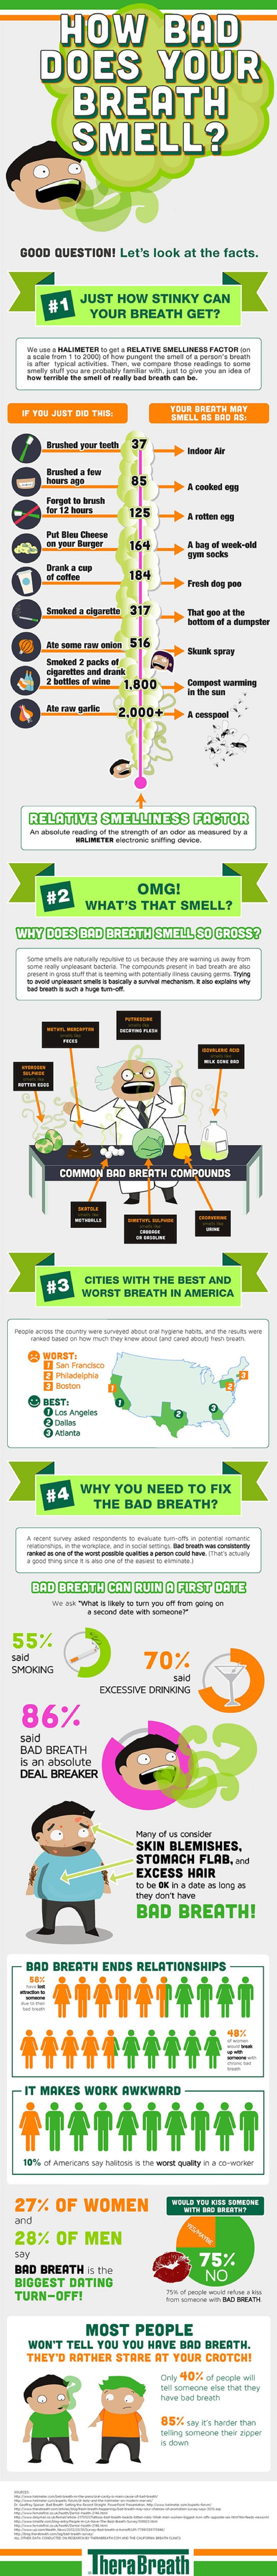 bad-breath-infographic